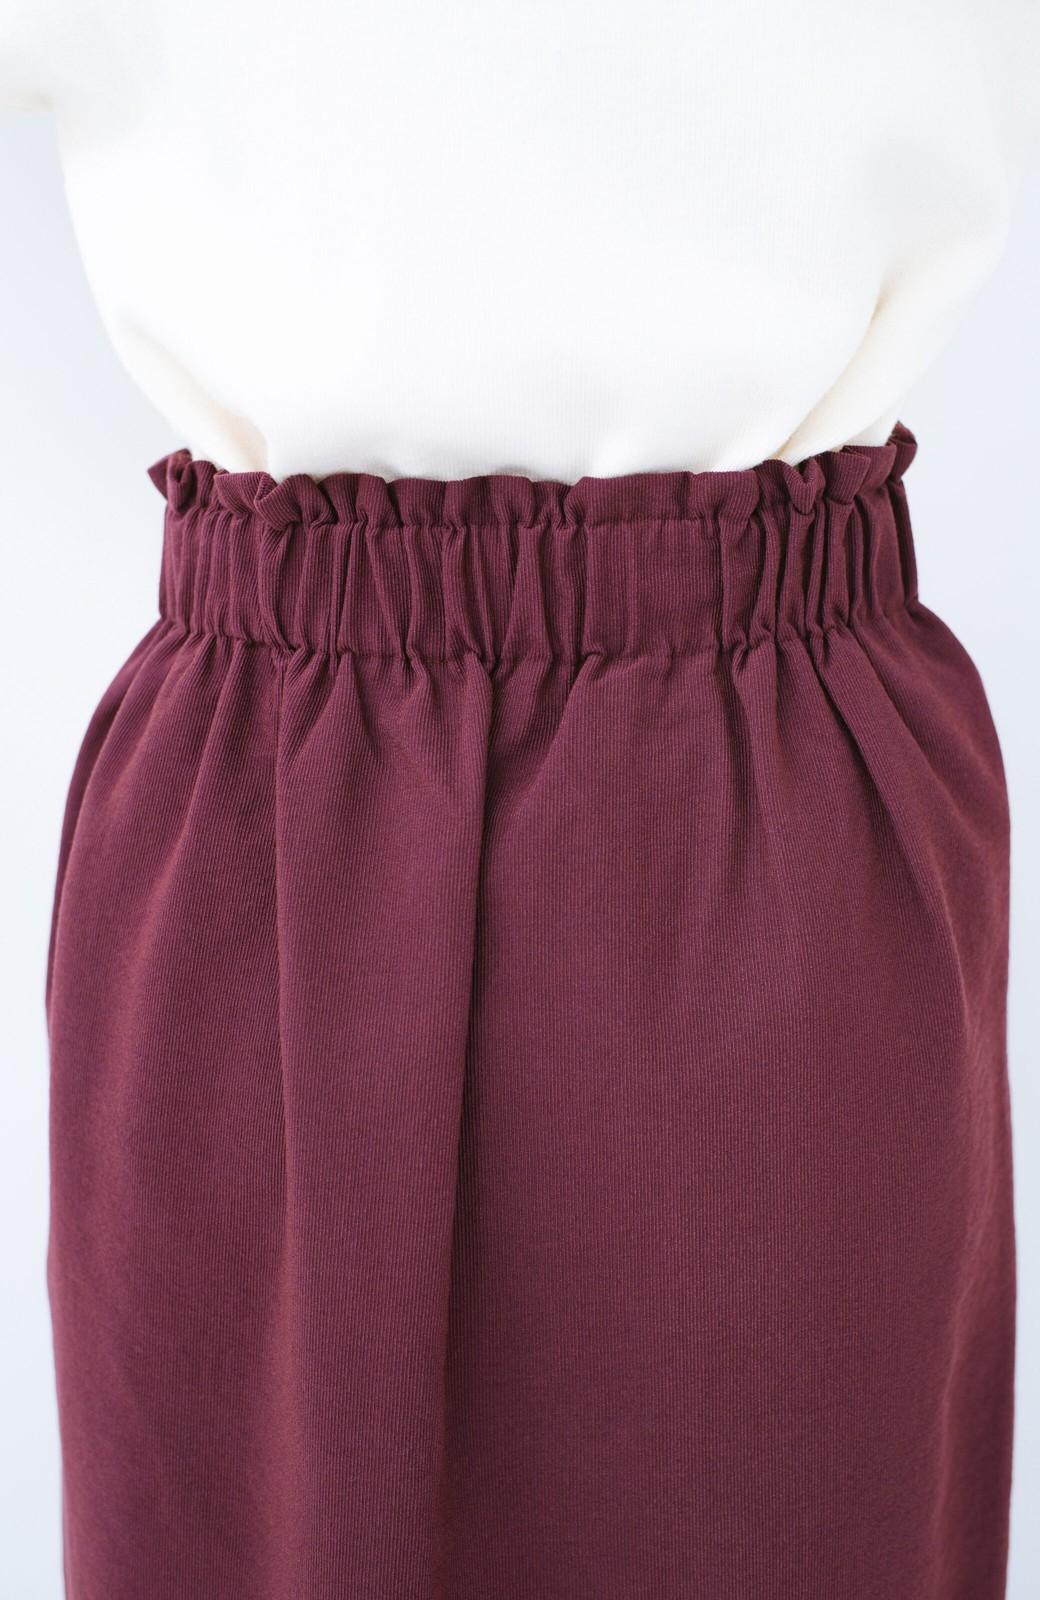 haco!  腹巻きとは呼ばせない ブルー期も華やかに過ごせる消臭加工裏地付きフリルデザインスカートセット【ブルー期】女の子バンザイ!プロジェクト <ボルドー>の商品写真18